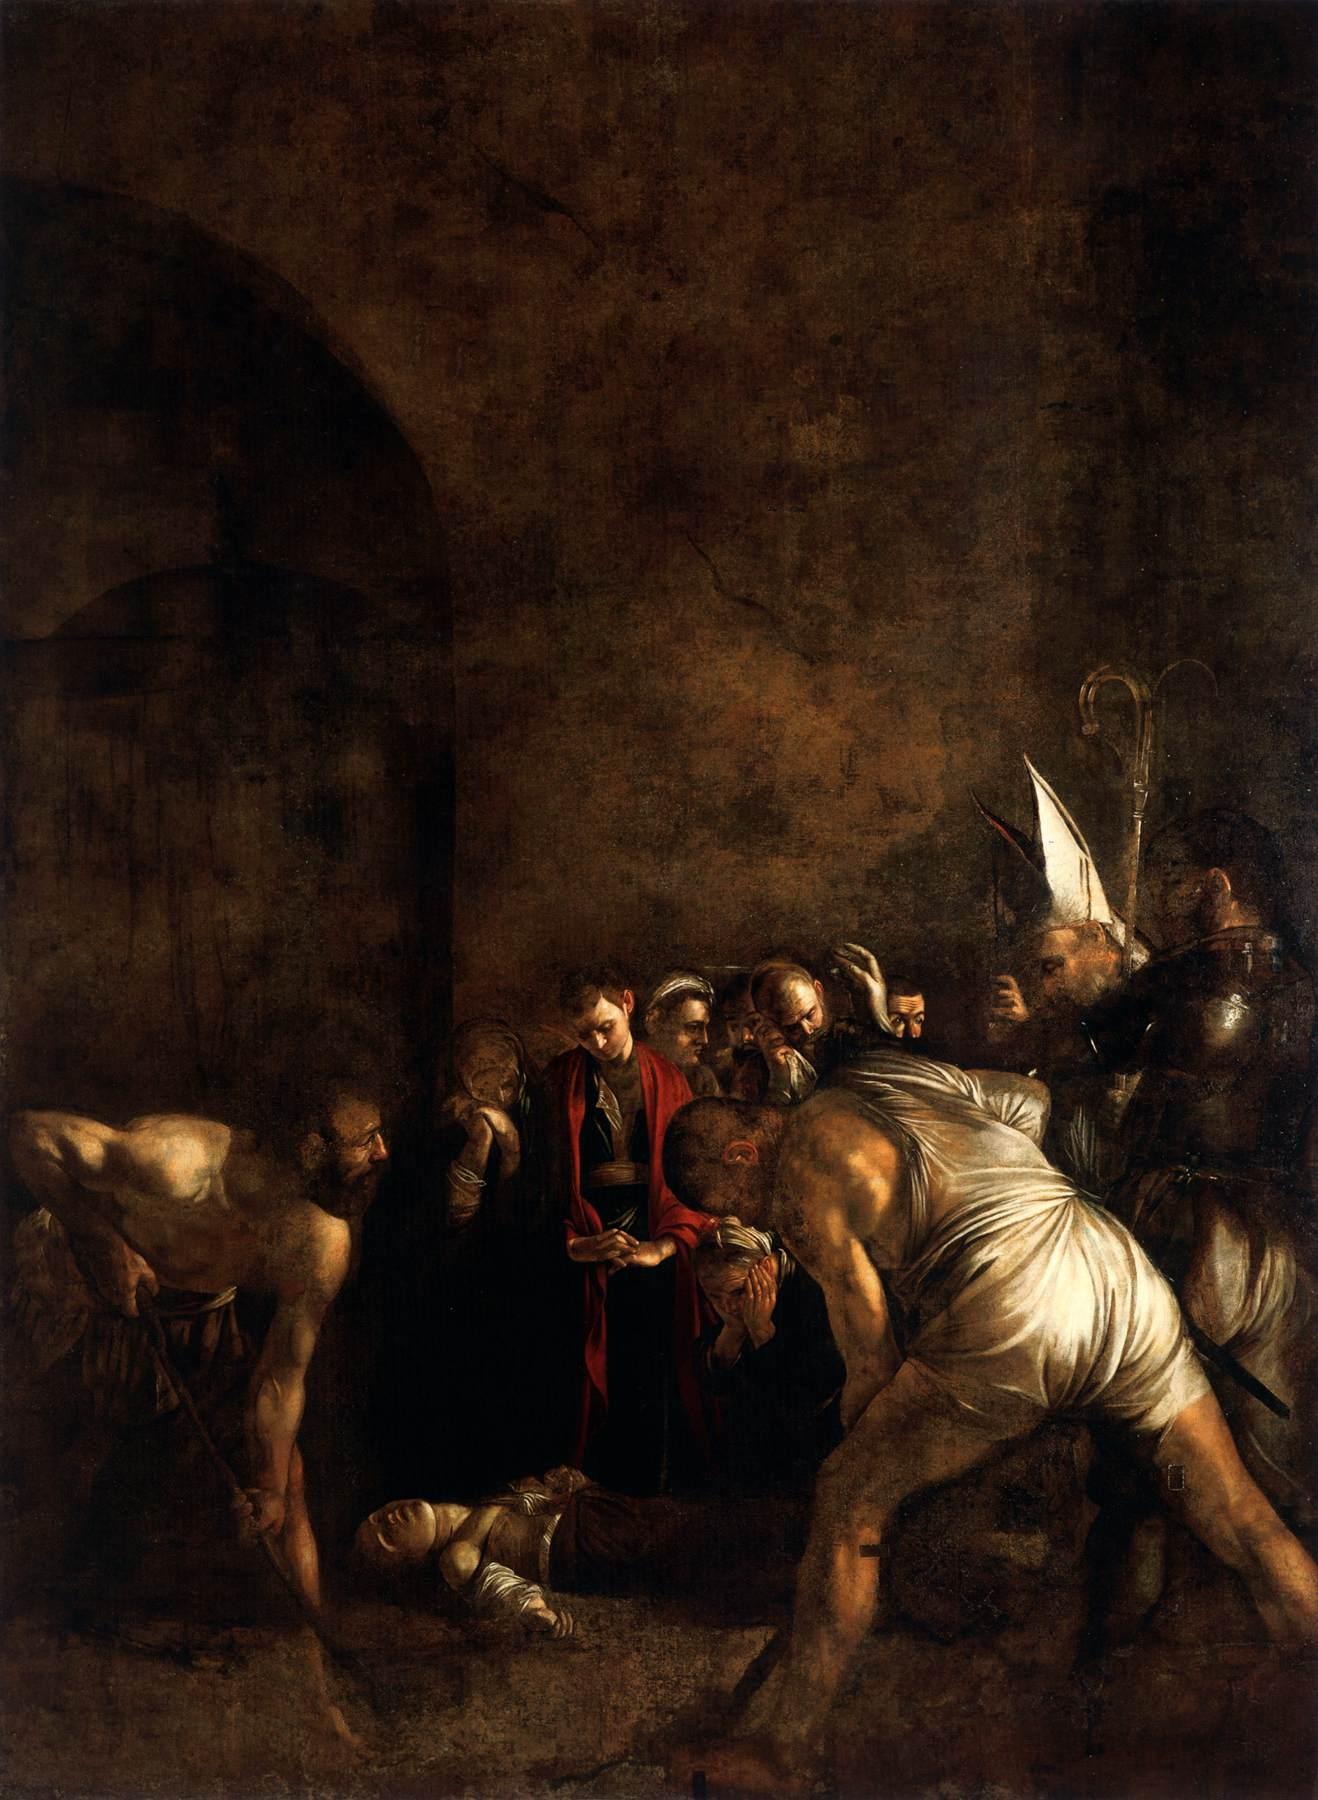 seppellimentodis-1579711093.+Lucia+-+Caravaggio+-+Siracusa